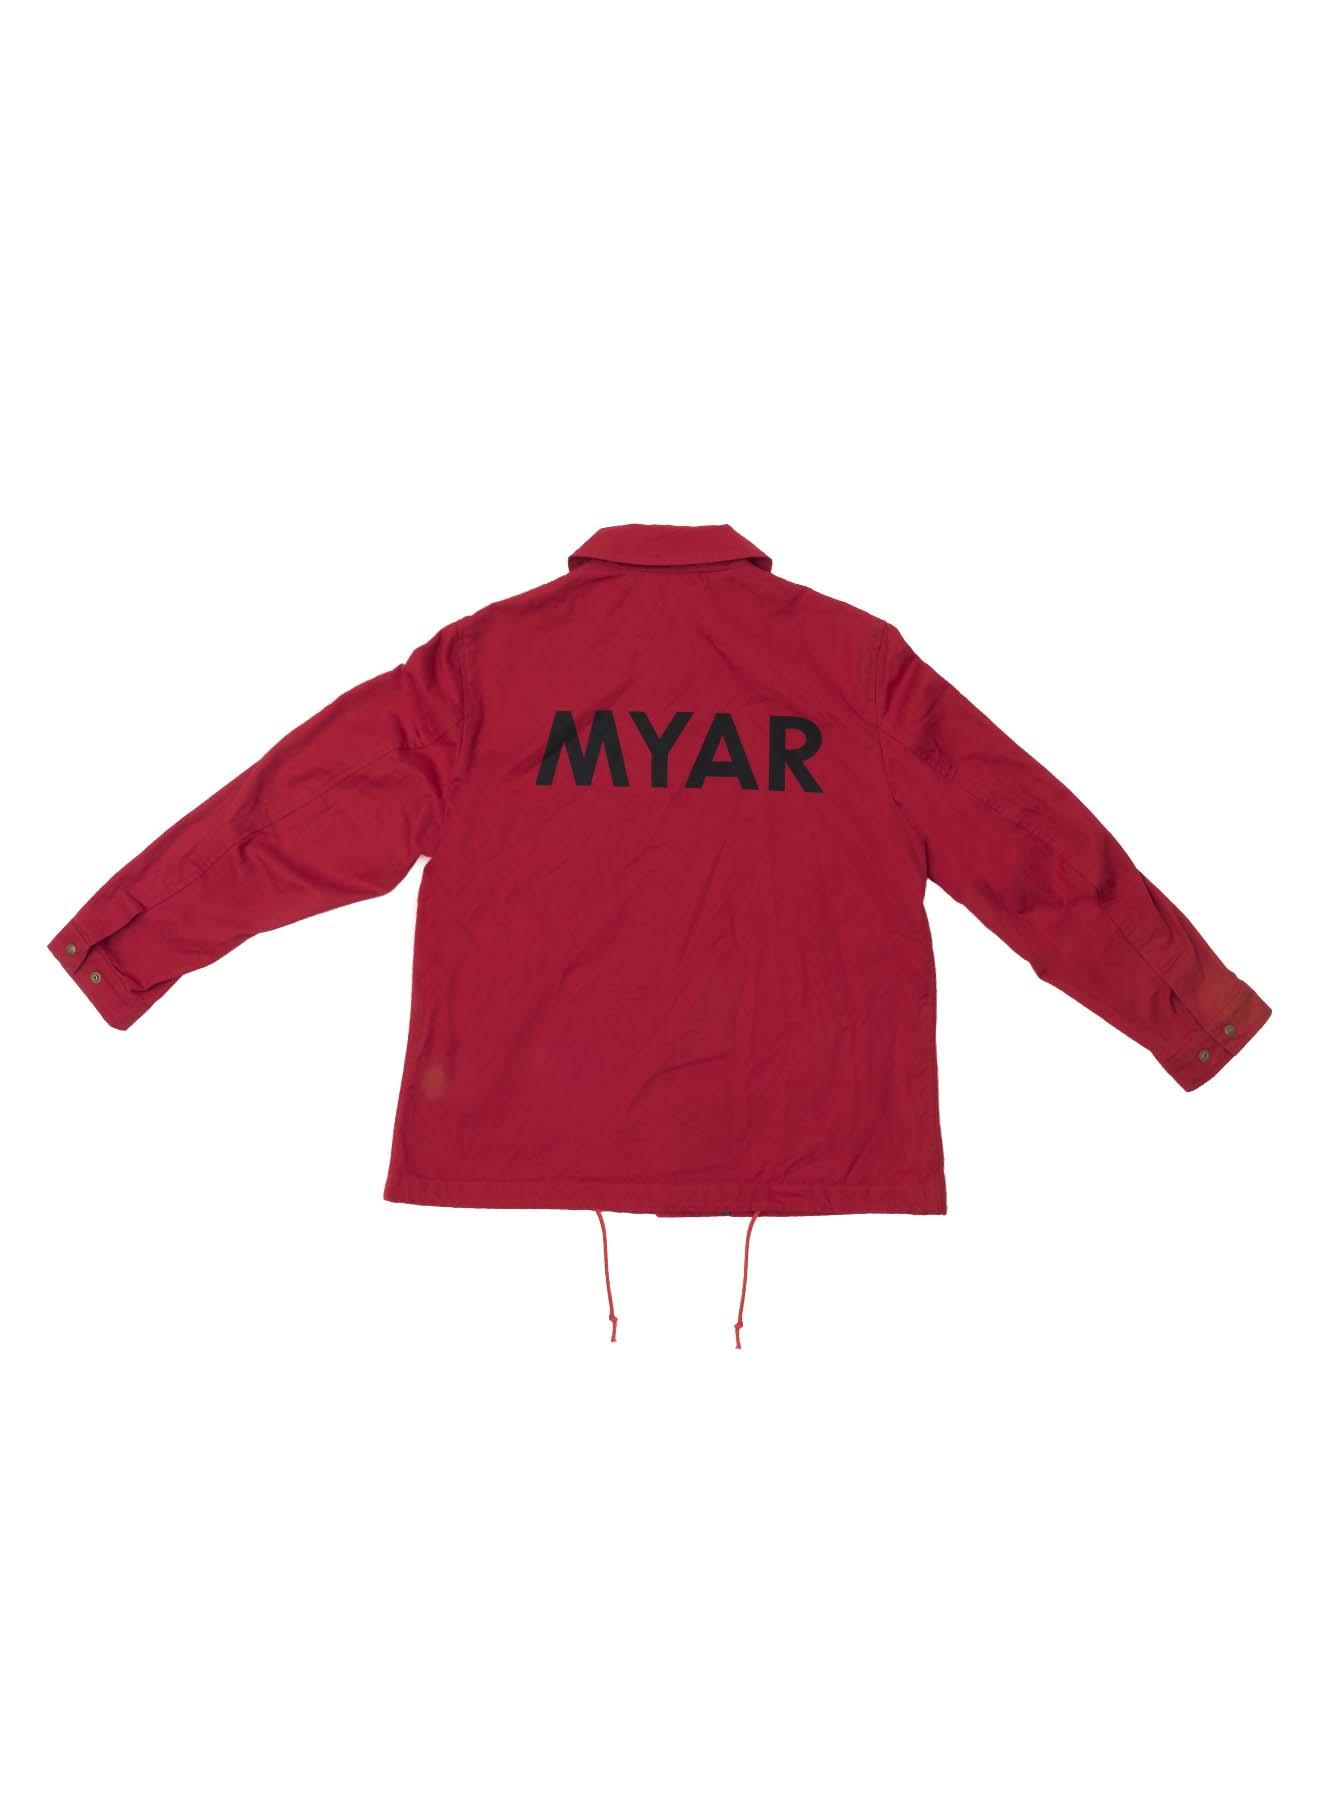 MYAR_MYJC09_back.jpg